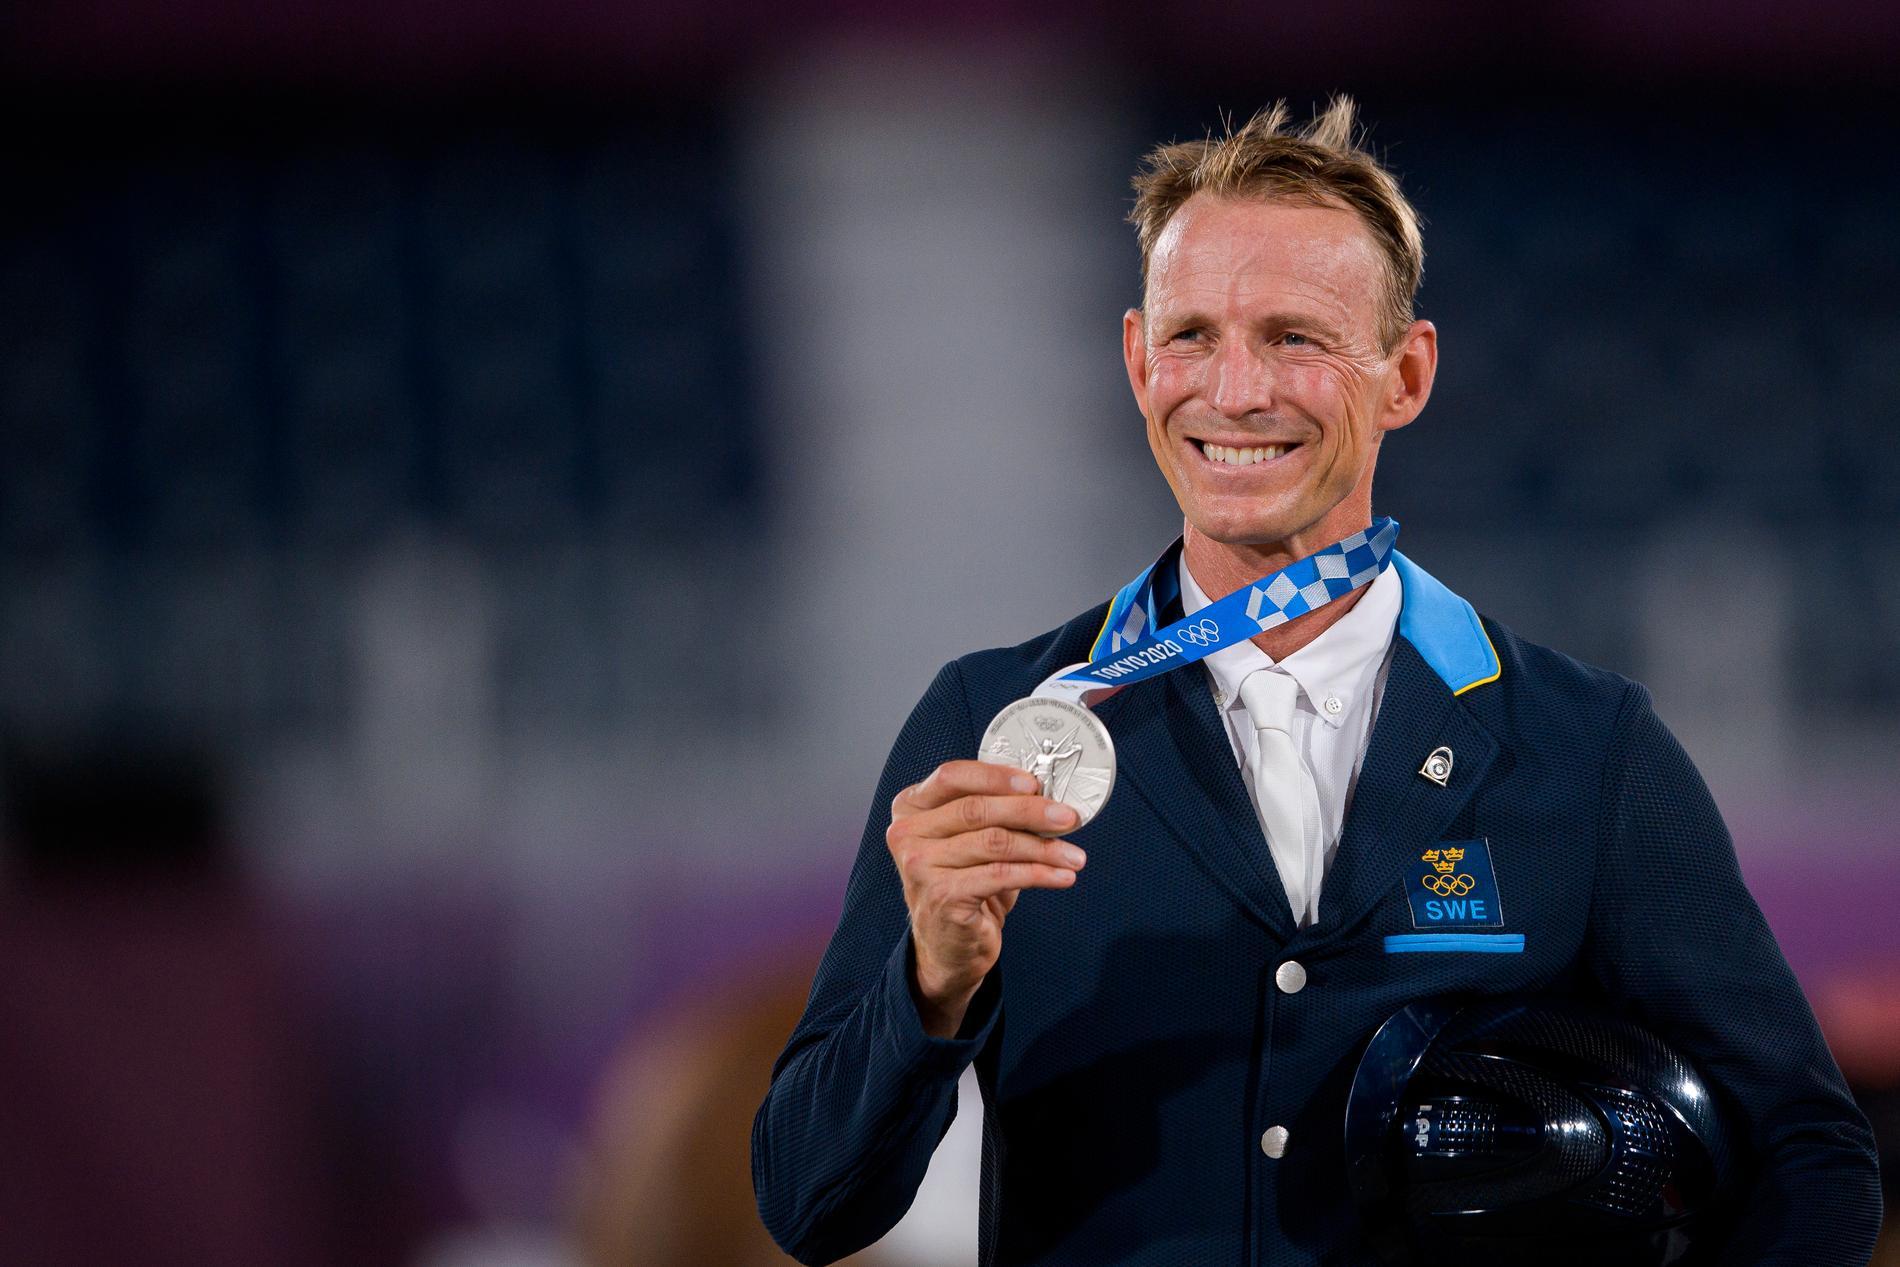 Peder Fredricson med silvermedaljen.